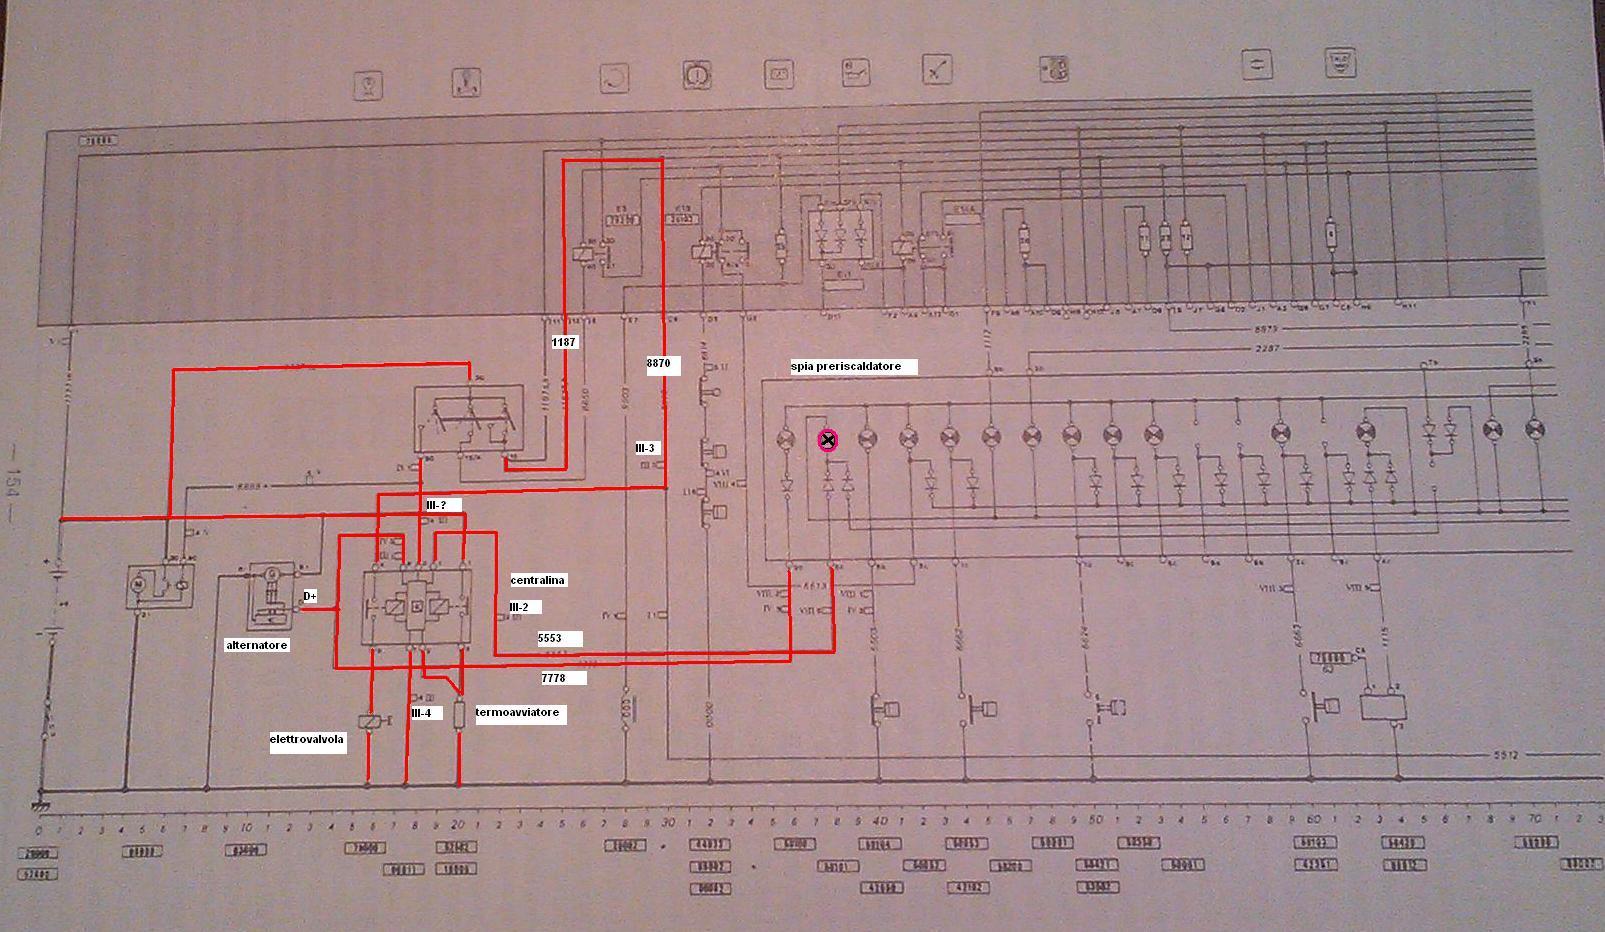 fiat grande punto 2007 fuse box diagram. Black Bedroom Furniture Sets. Home Design Ideas